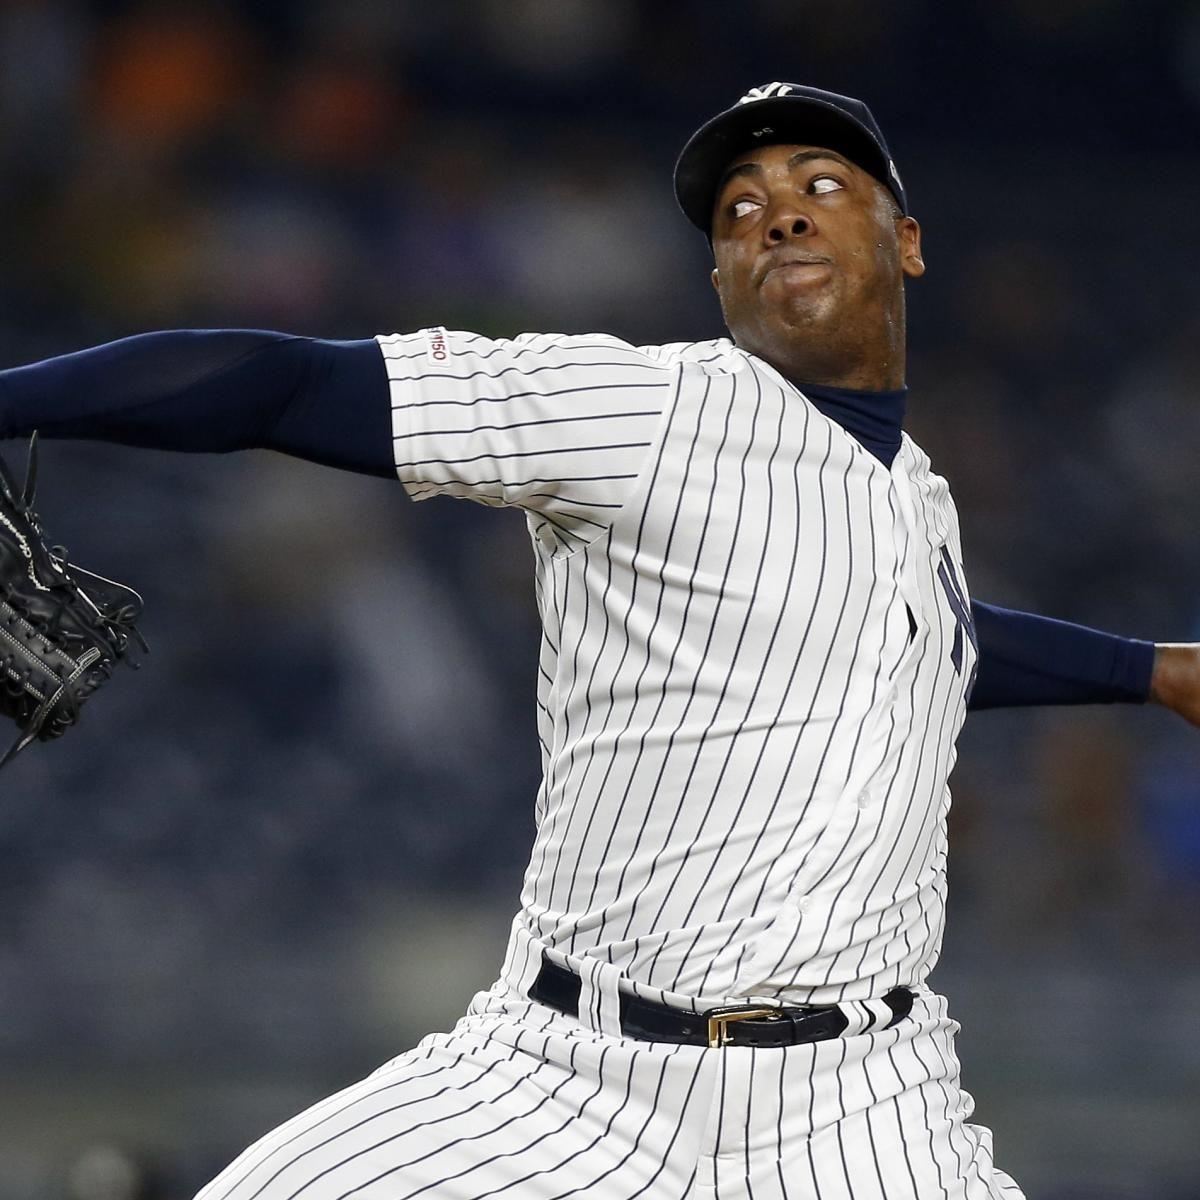 Yankees Aroldis Chapman Brewers Josh Hader Named 2019 Relievers Of The Year Aroldis Chapman Yankees Brewers